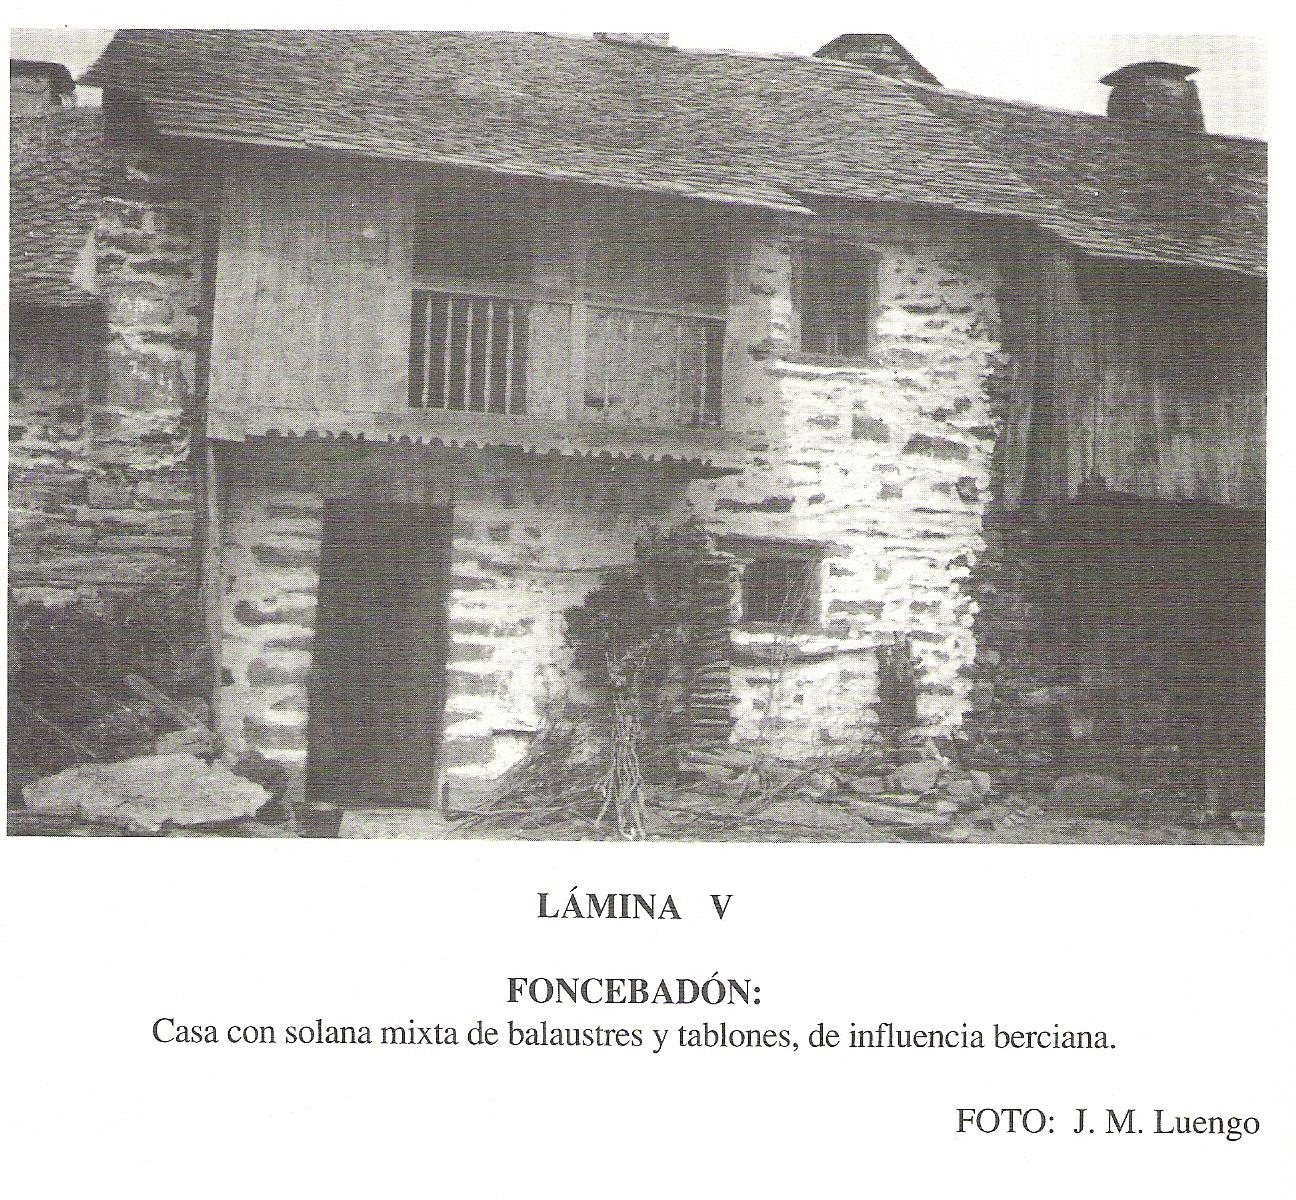 Foncebadón, casa antigua